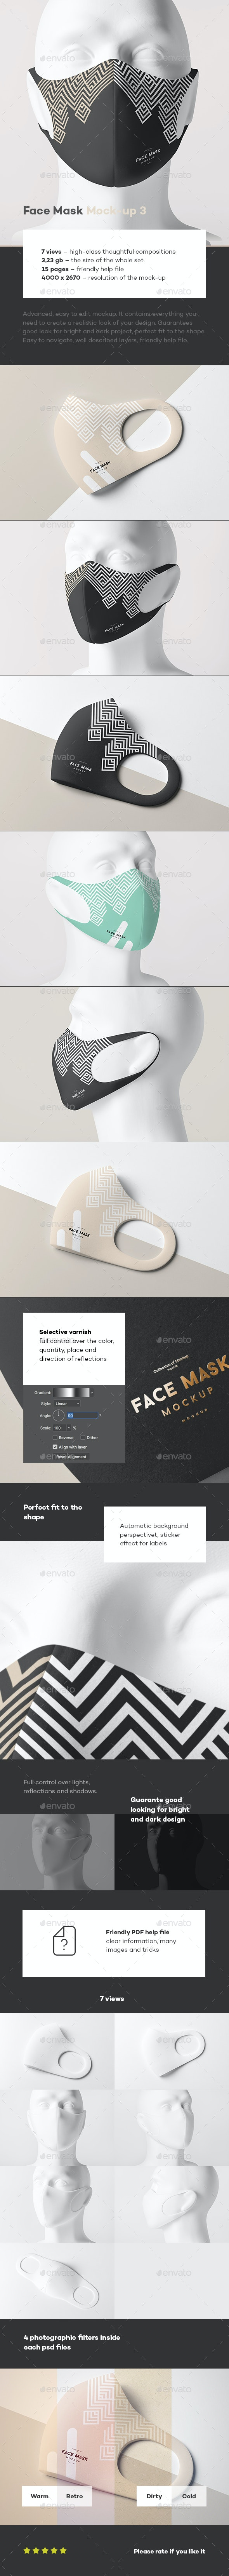 Face Mask Mock-up 3